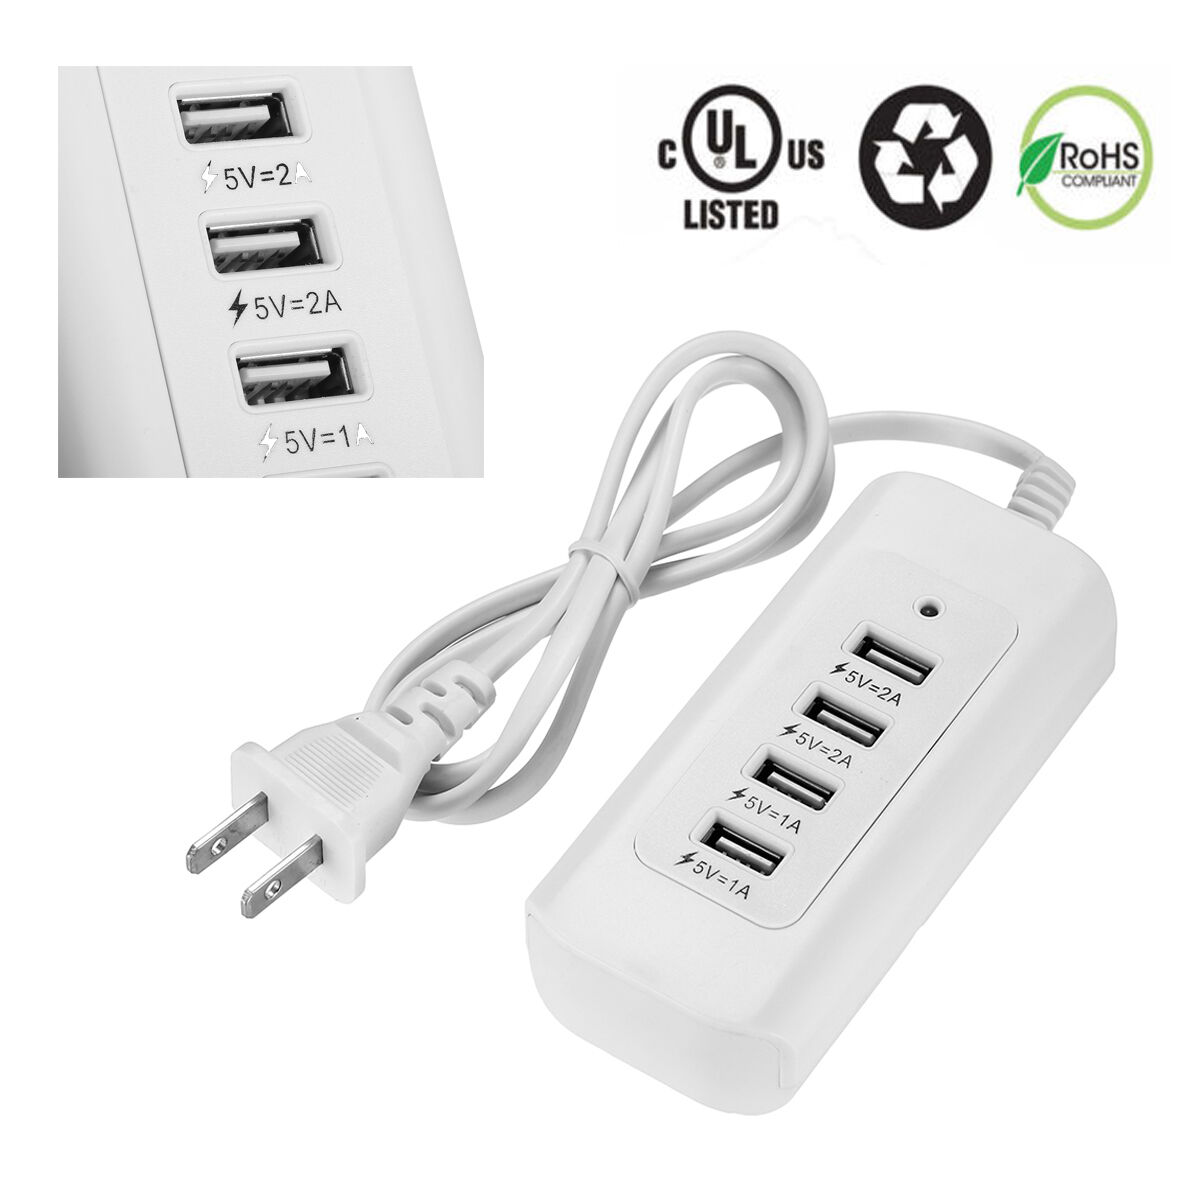 4usb power strip us charging